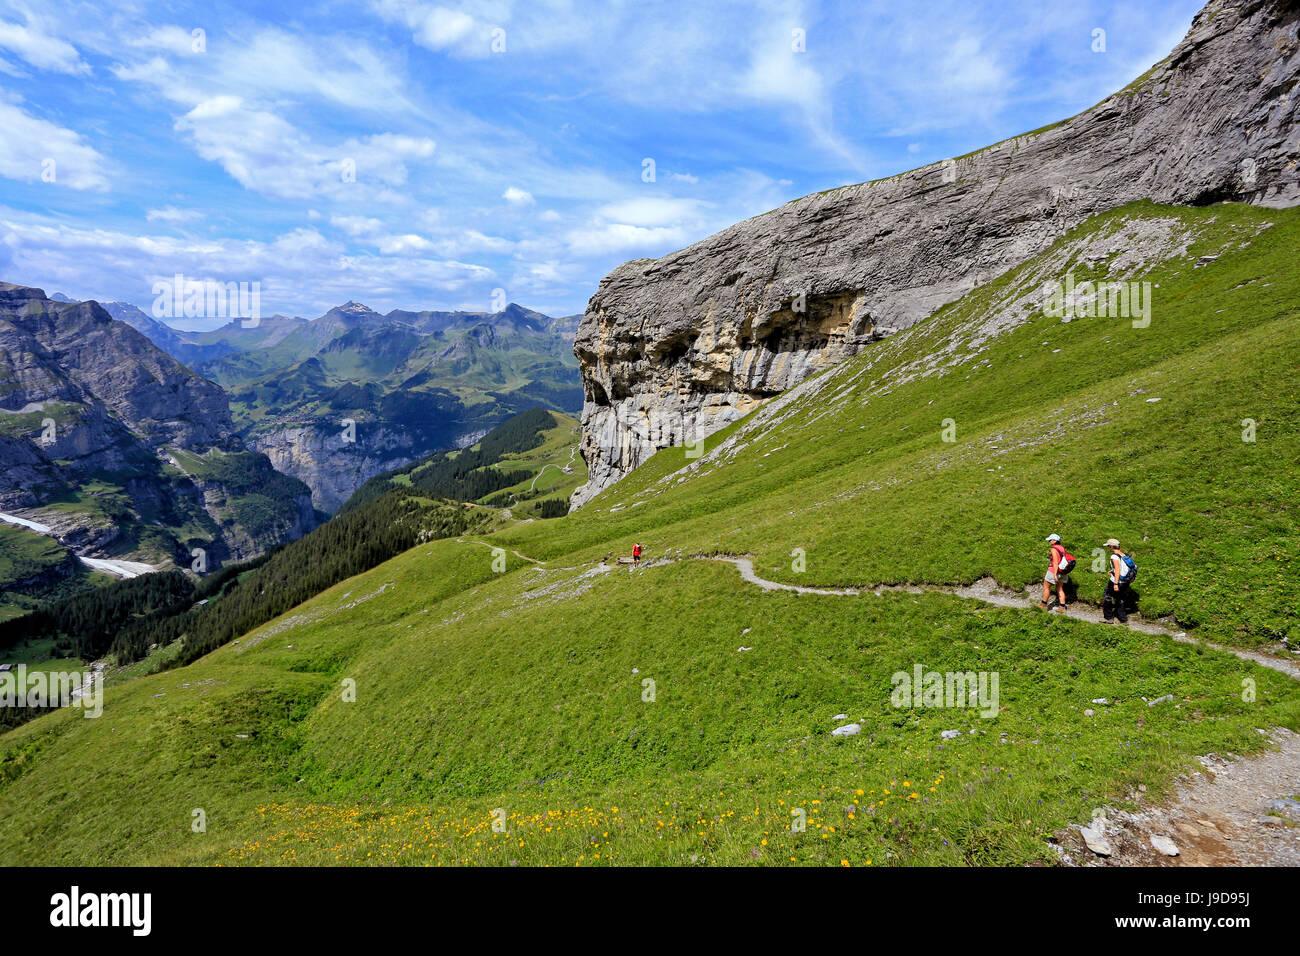 Gli escursionisti a Kleine Scheidegg, Grindelwald, Oberland bernese, Svizzera, Europa Immagini Stock